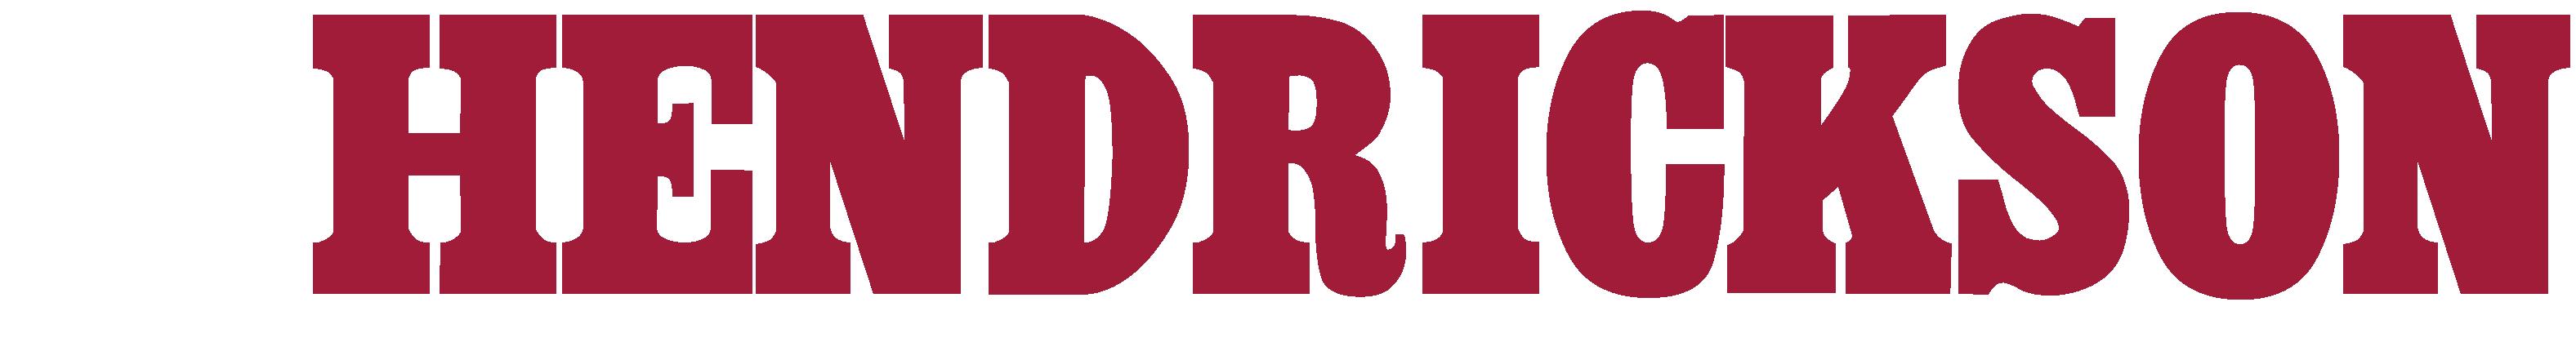 fleetsworld.com_hendrickson_logo